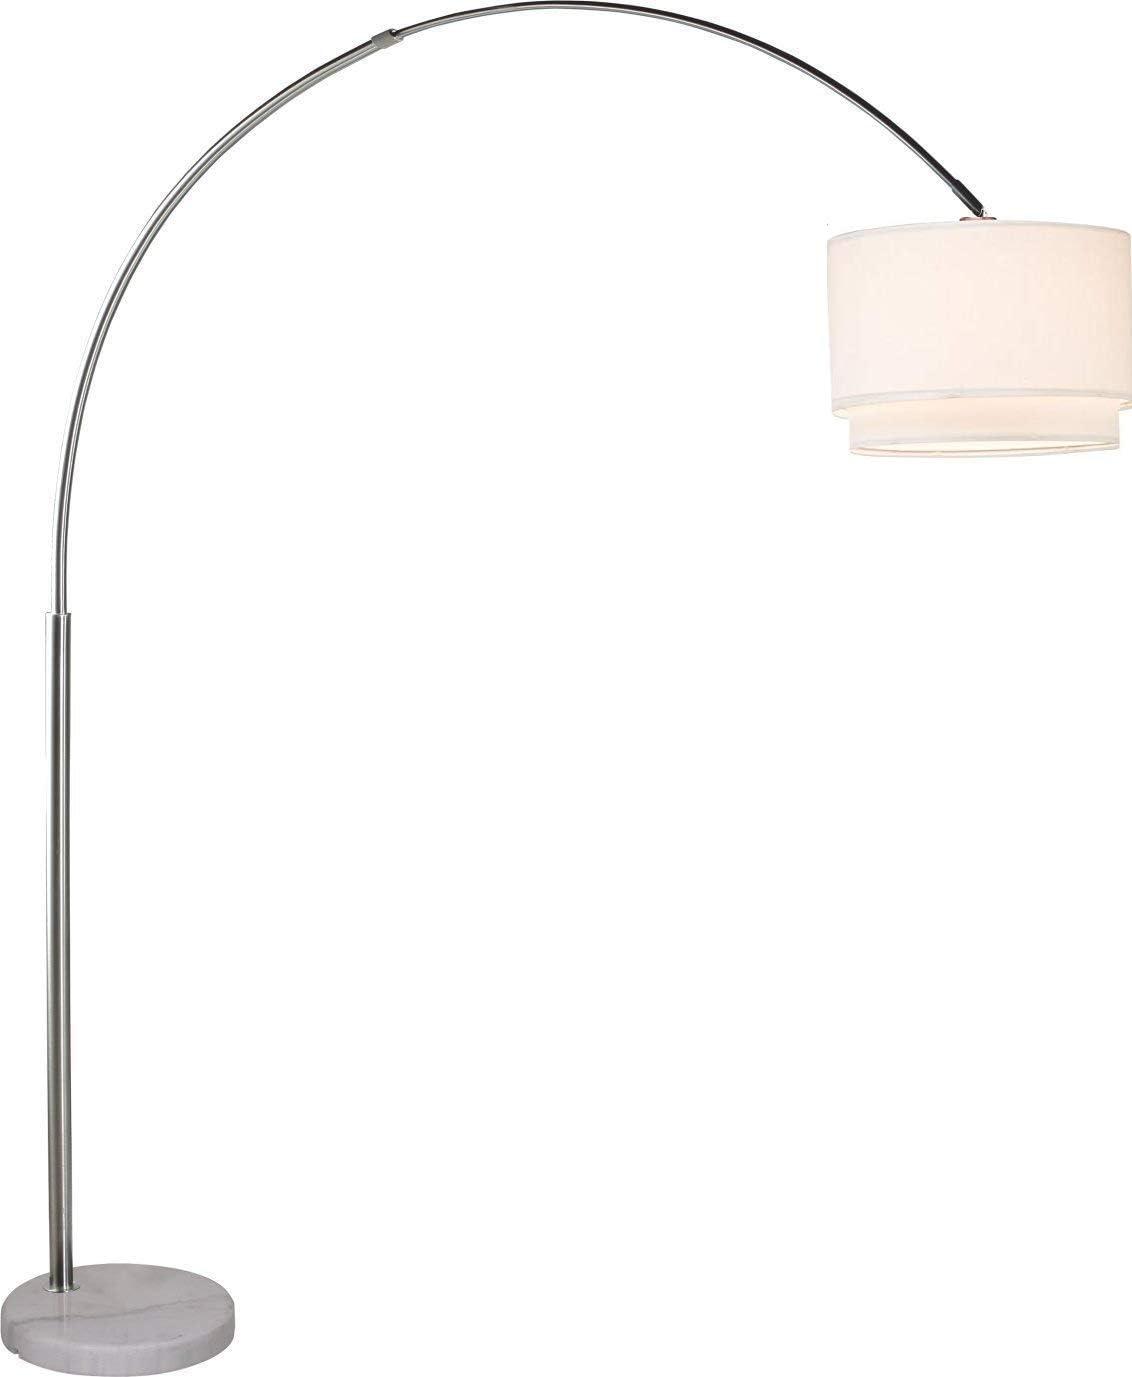 mahogany ash arch lamp veneer lamp plywood lamp modern lamp wood lamp Floor lamp design lamp